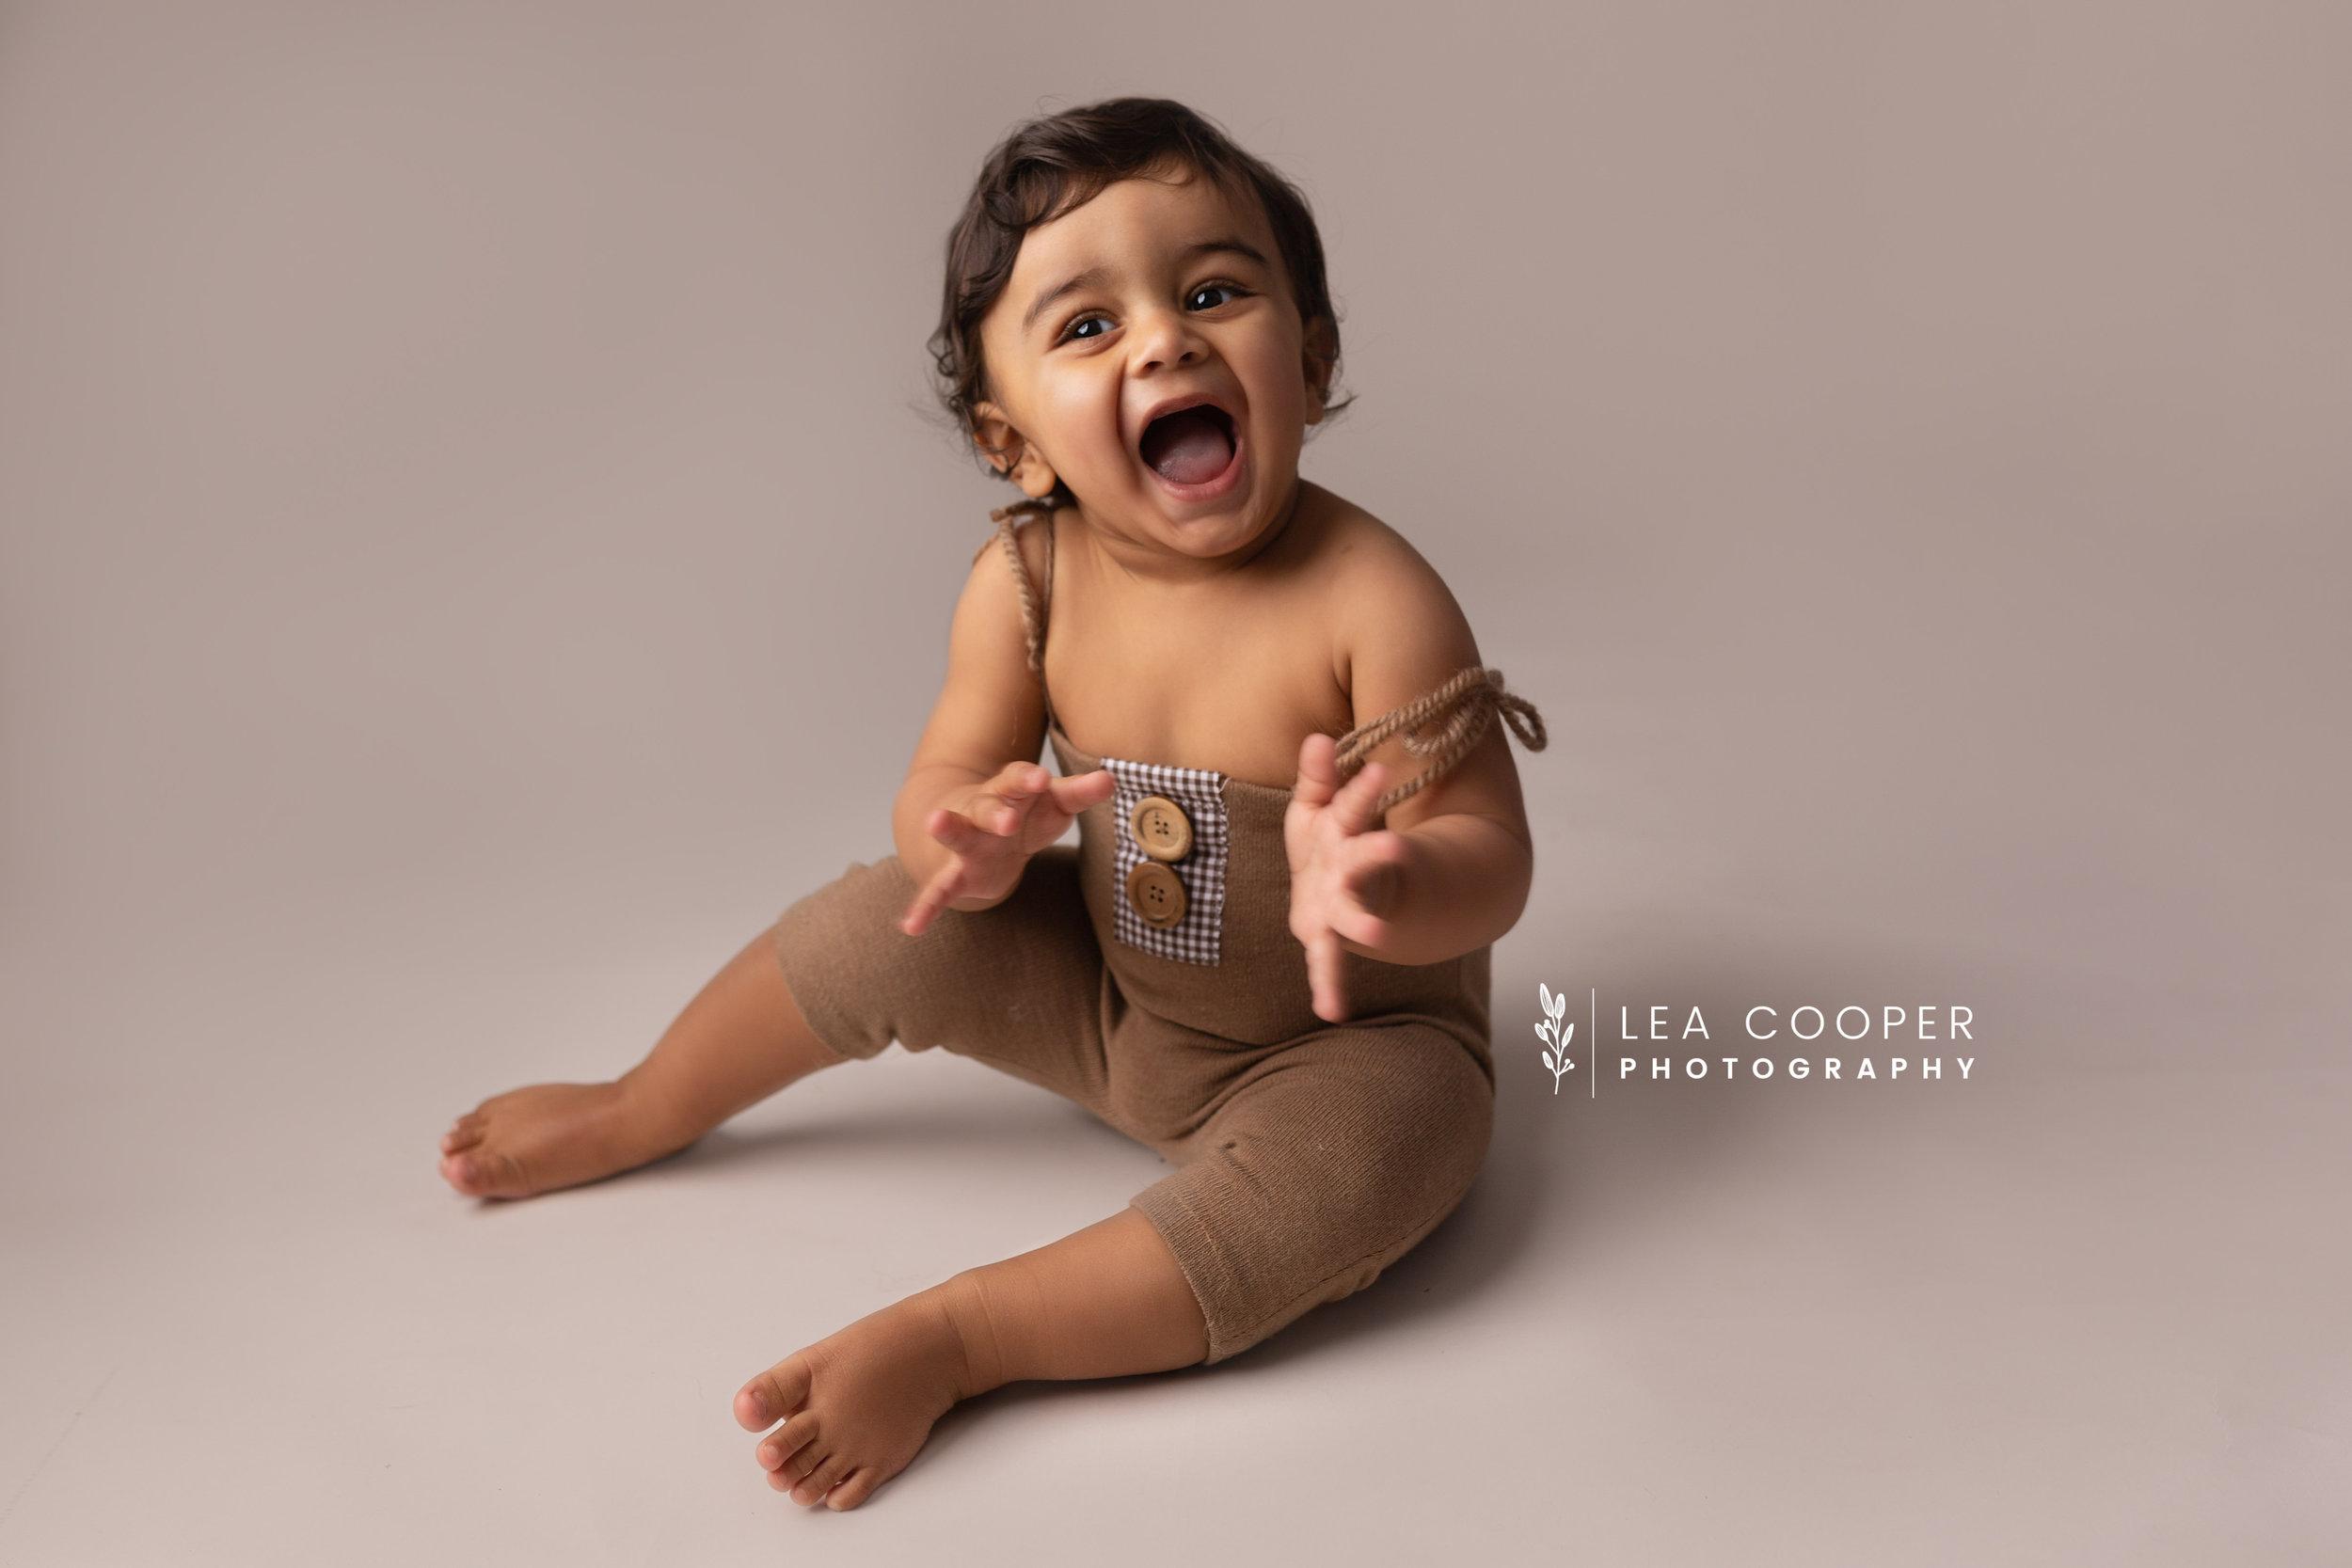 LEA-COOPER-PHOTOGRAPHY-CAKE-SMASH-PHOTOGRAPHER-WILLENALL-WOLVERHAMPTON-CHILD-PHOTOSHOOT-1ST—BIRTHDAY-PICTURES-WEDNESBURY-WALSALL-DUDLEY-WEST-MIDLANDS-UK-9.JPG